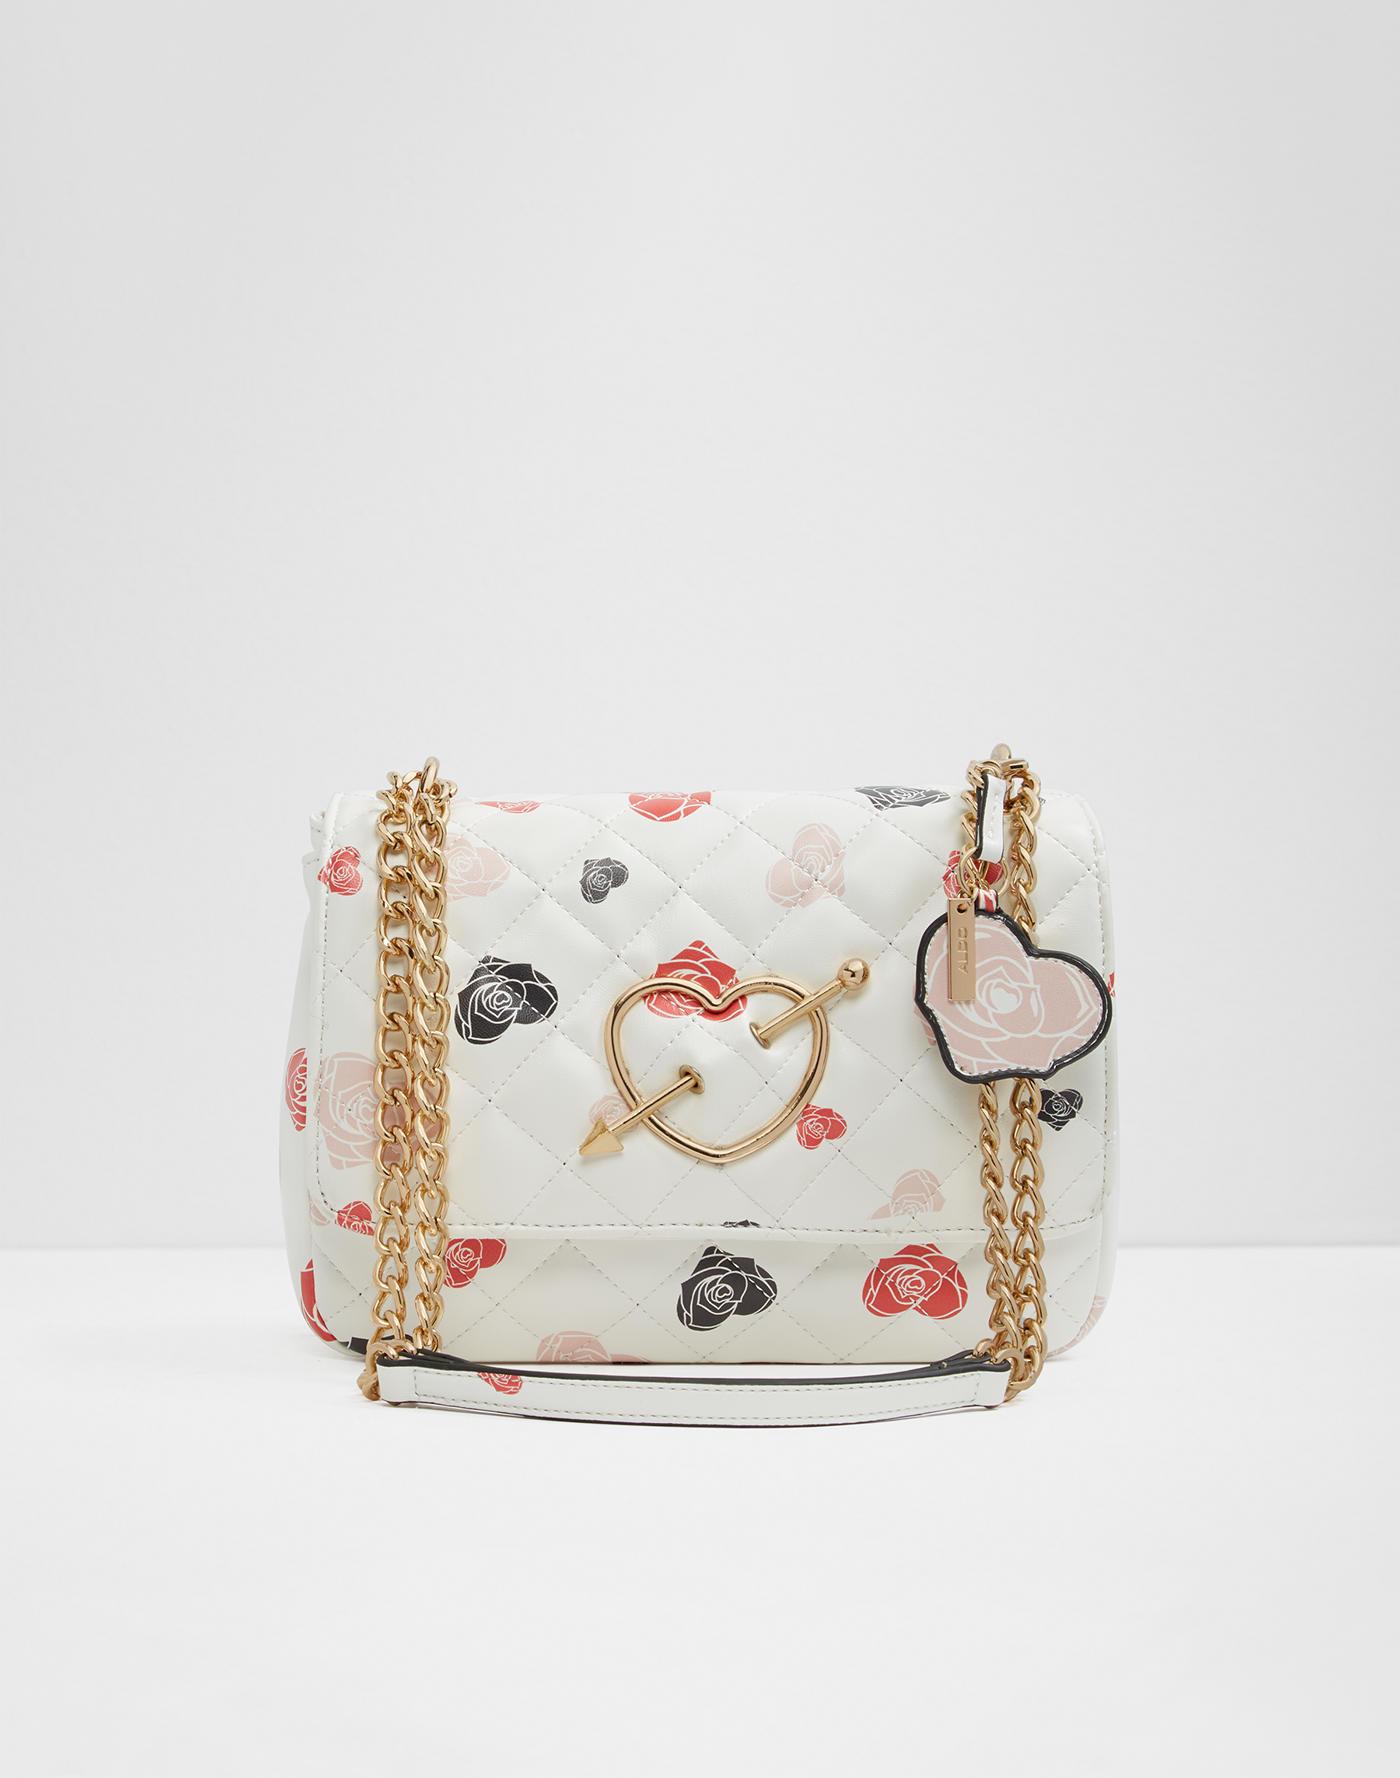 82afaa5404b78 Handbags on Sale for Women   ALDO Canada   ALDO Canada